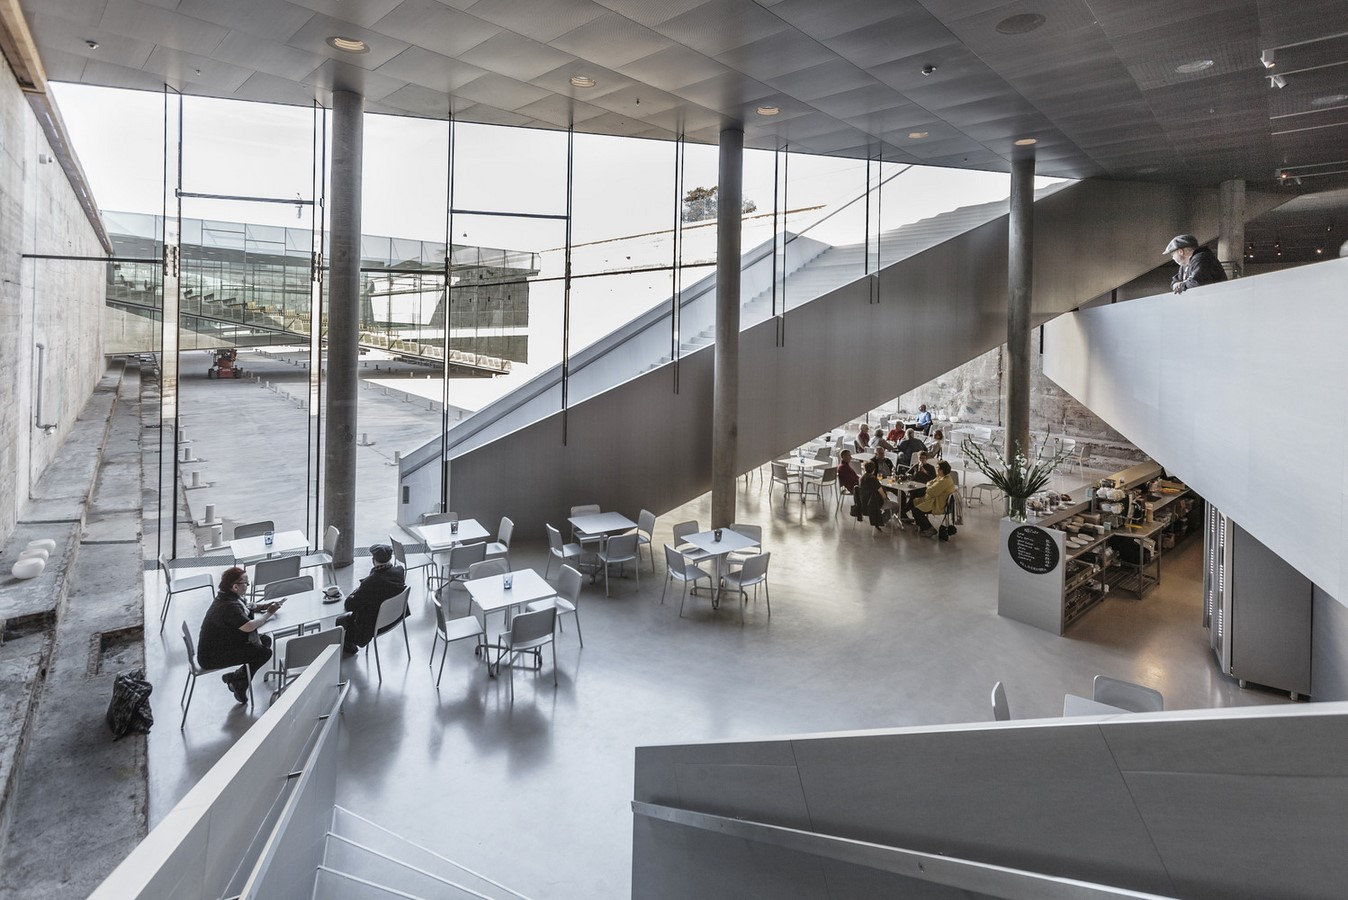 Danish National Maritime Museum by BIG: Dock within the Dock - Sheet9